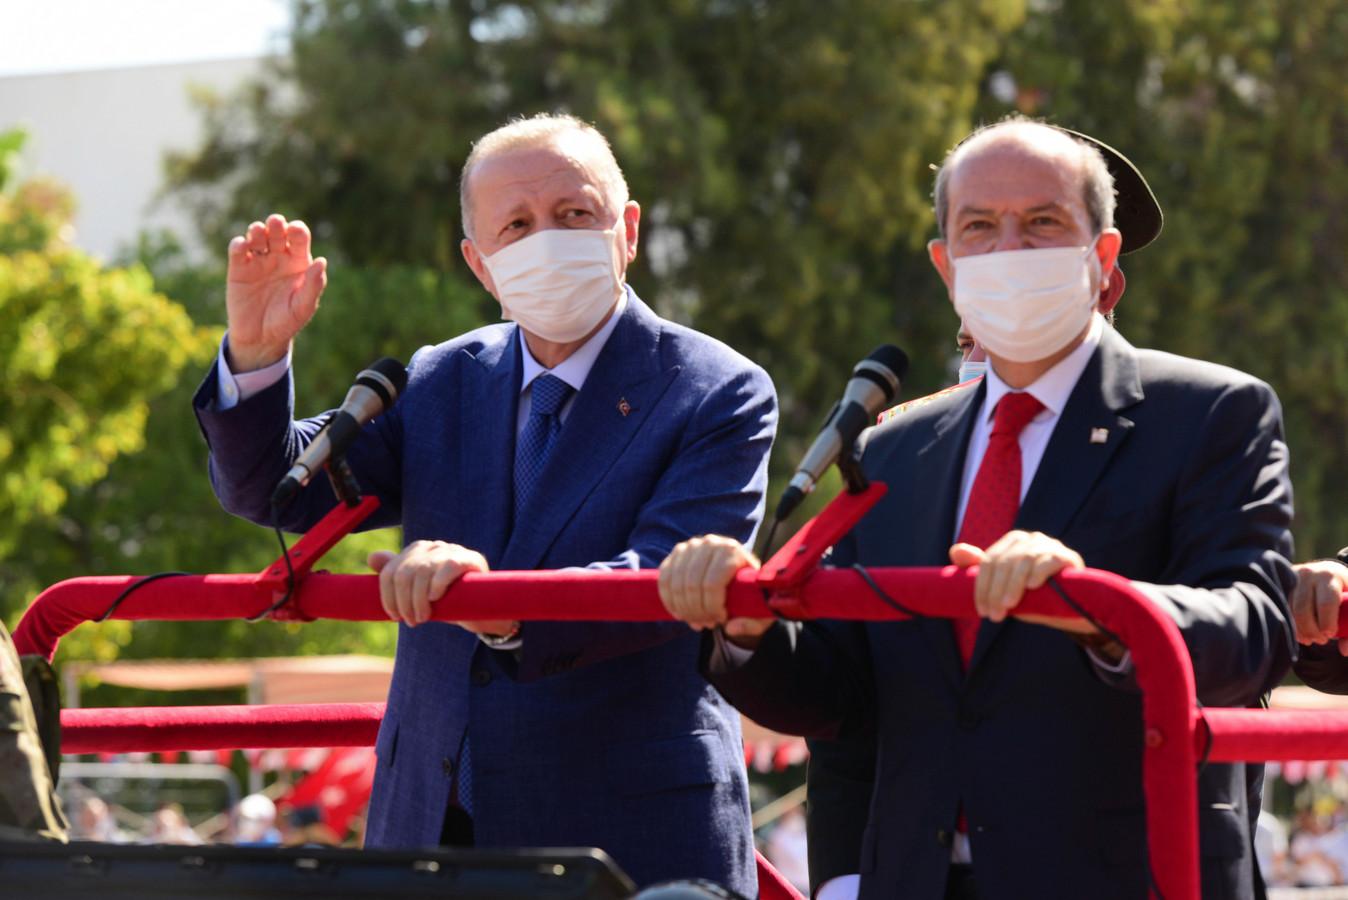 Recep Tayyip Erdogan et le leader nord-chypriote Ersin Tatar